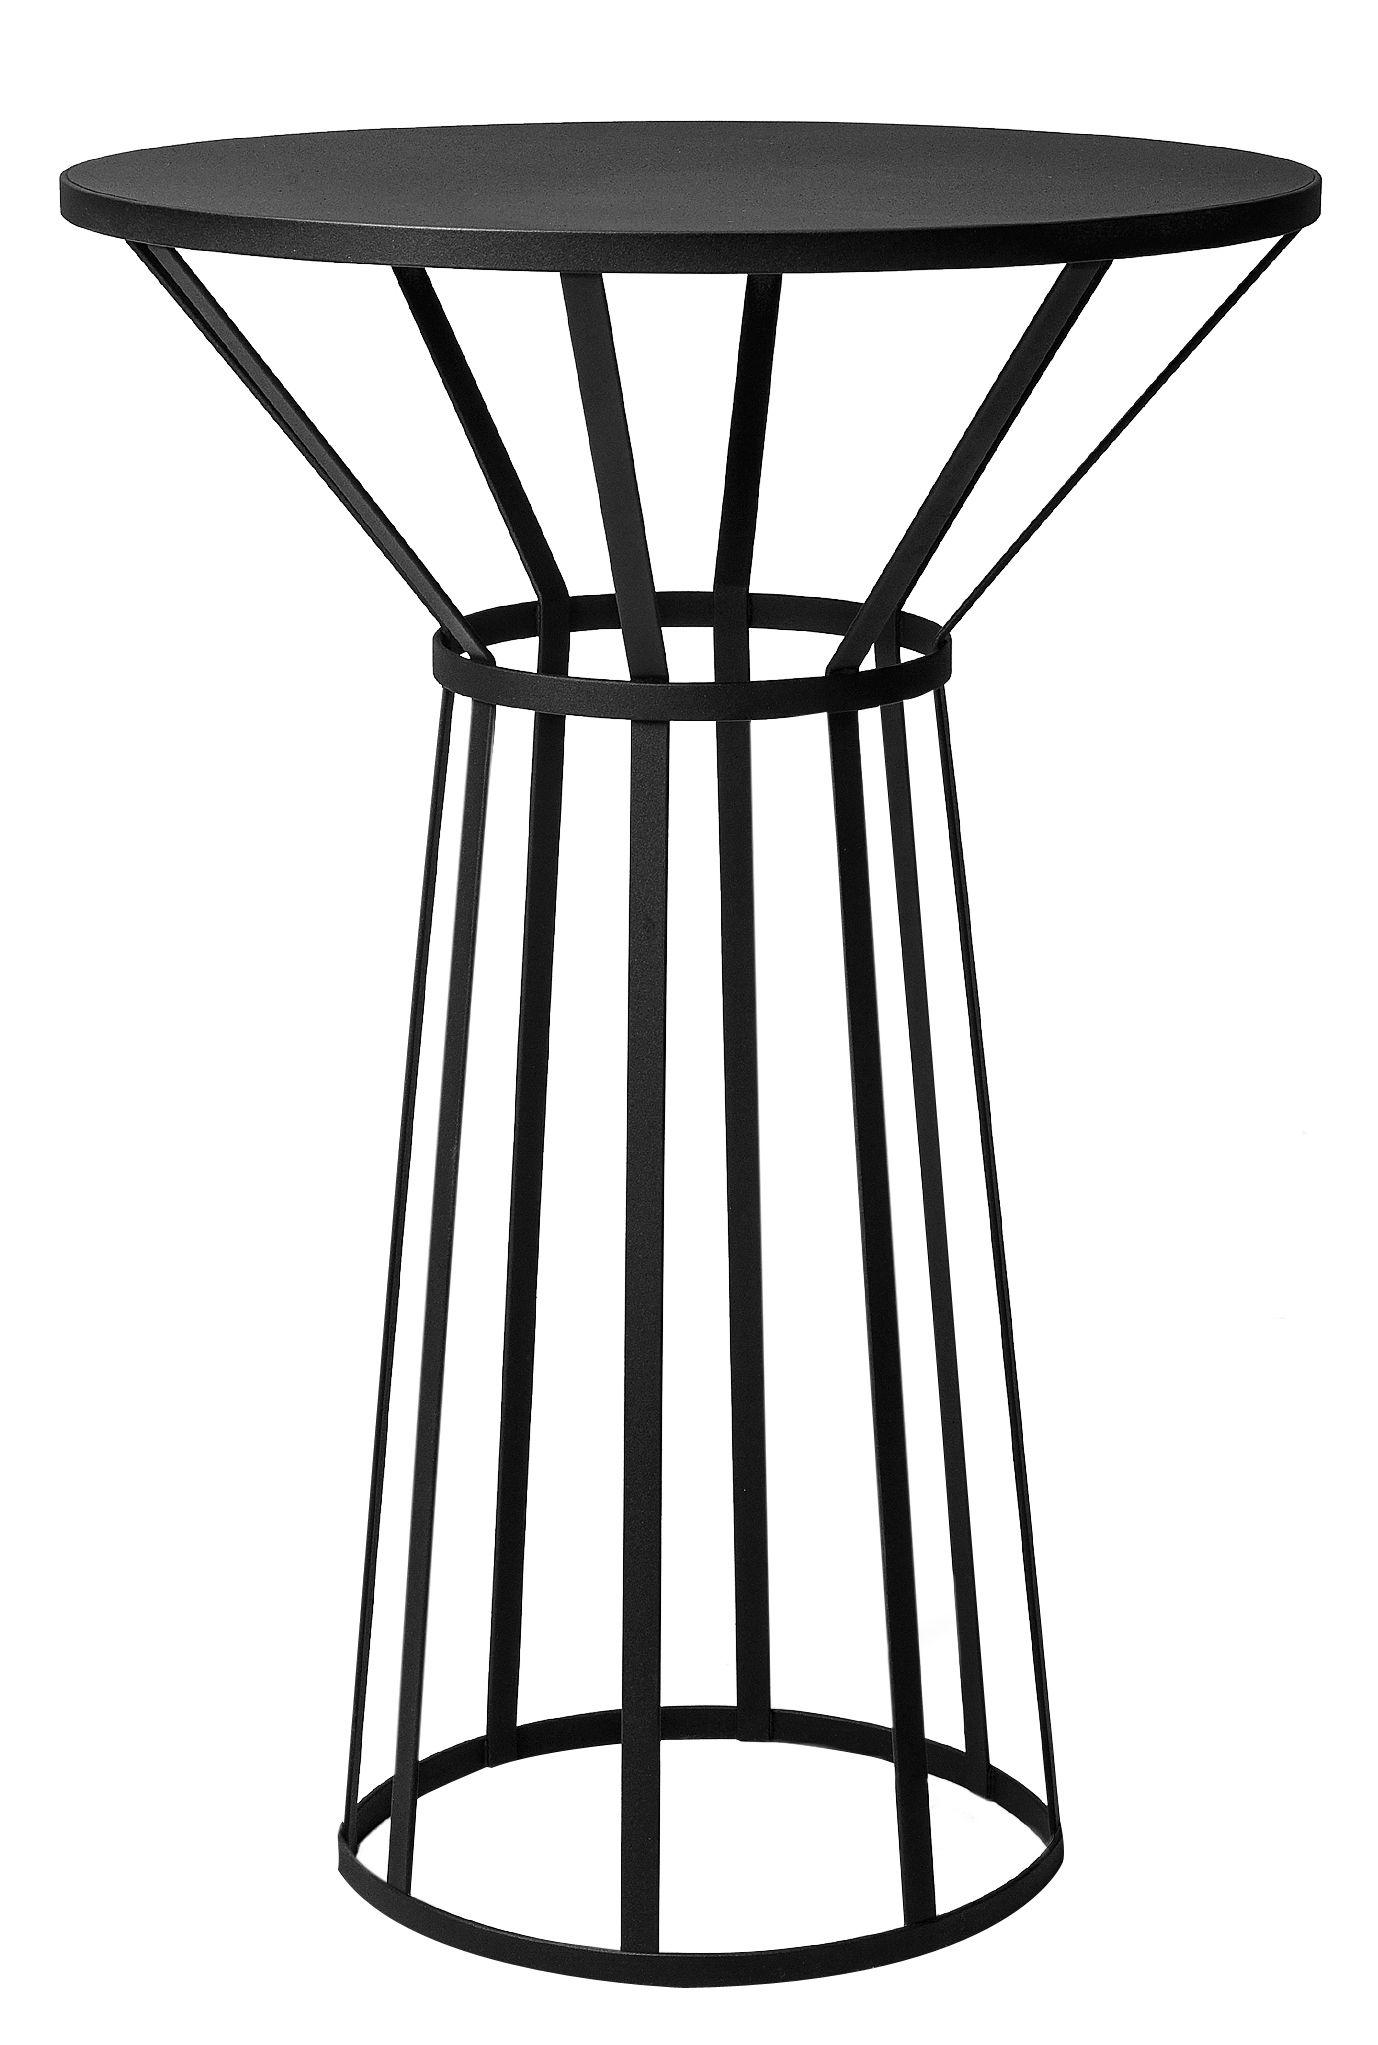 Arredamento - Tavolini  - Tavolino Hollo / Ø 50 x H 73 cm - Petite Friture - Nero - Acciaio inossidabile